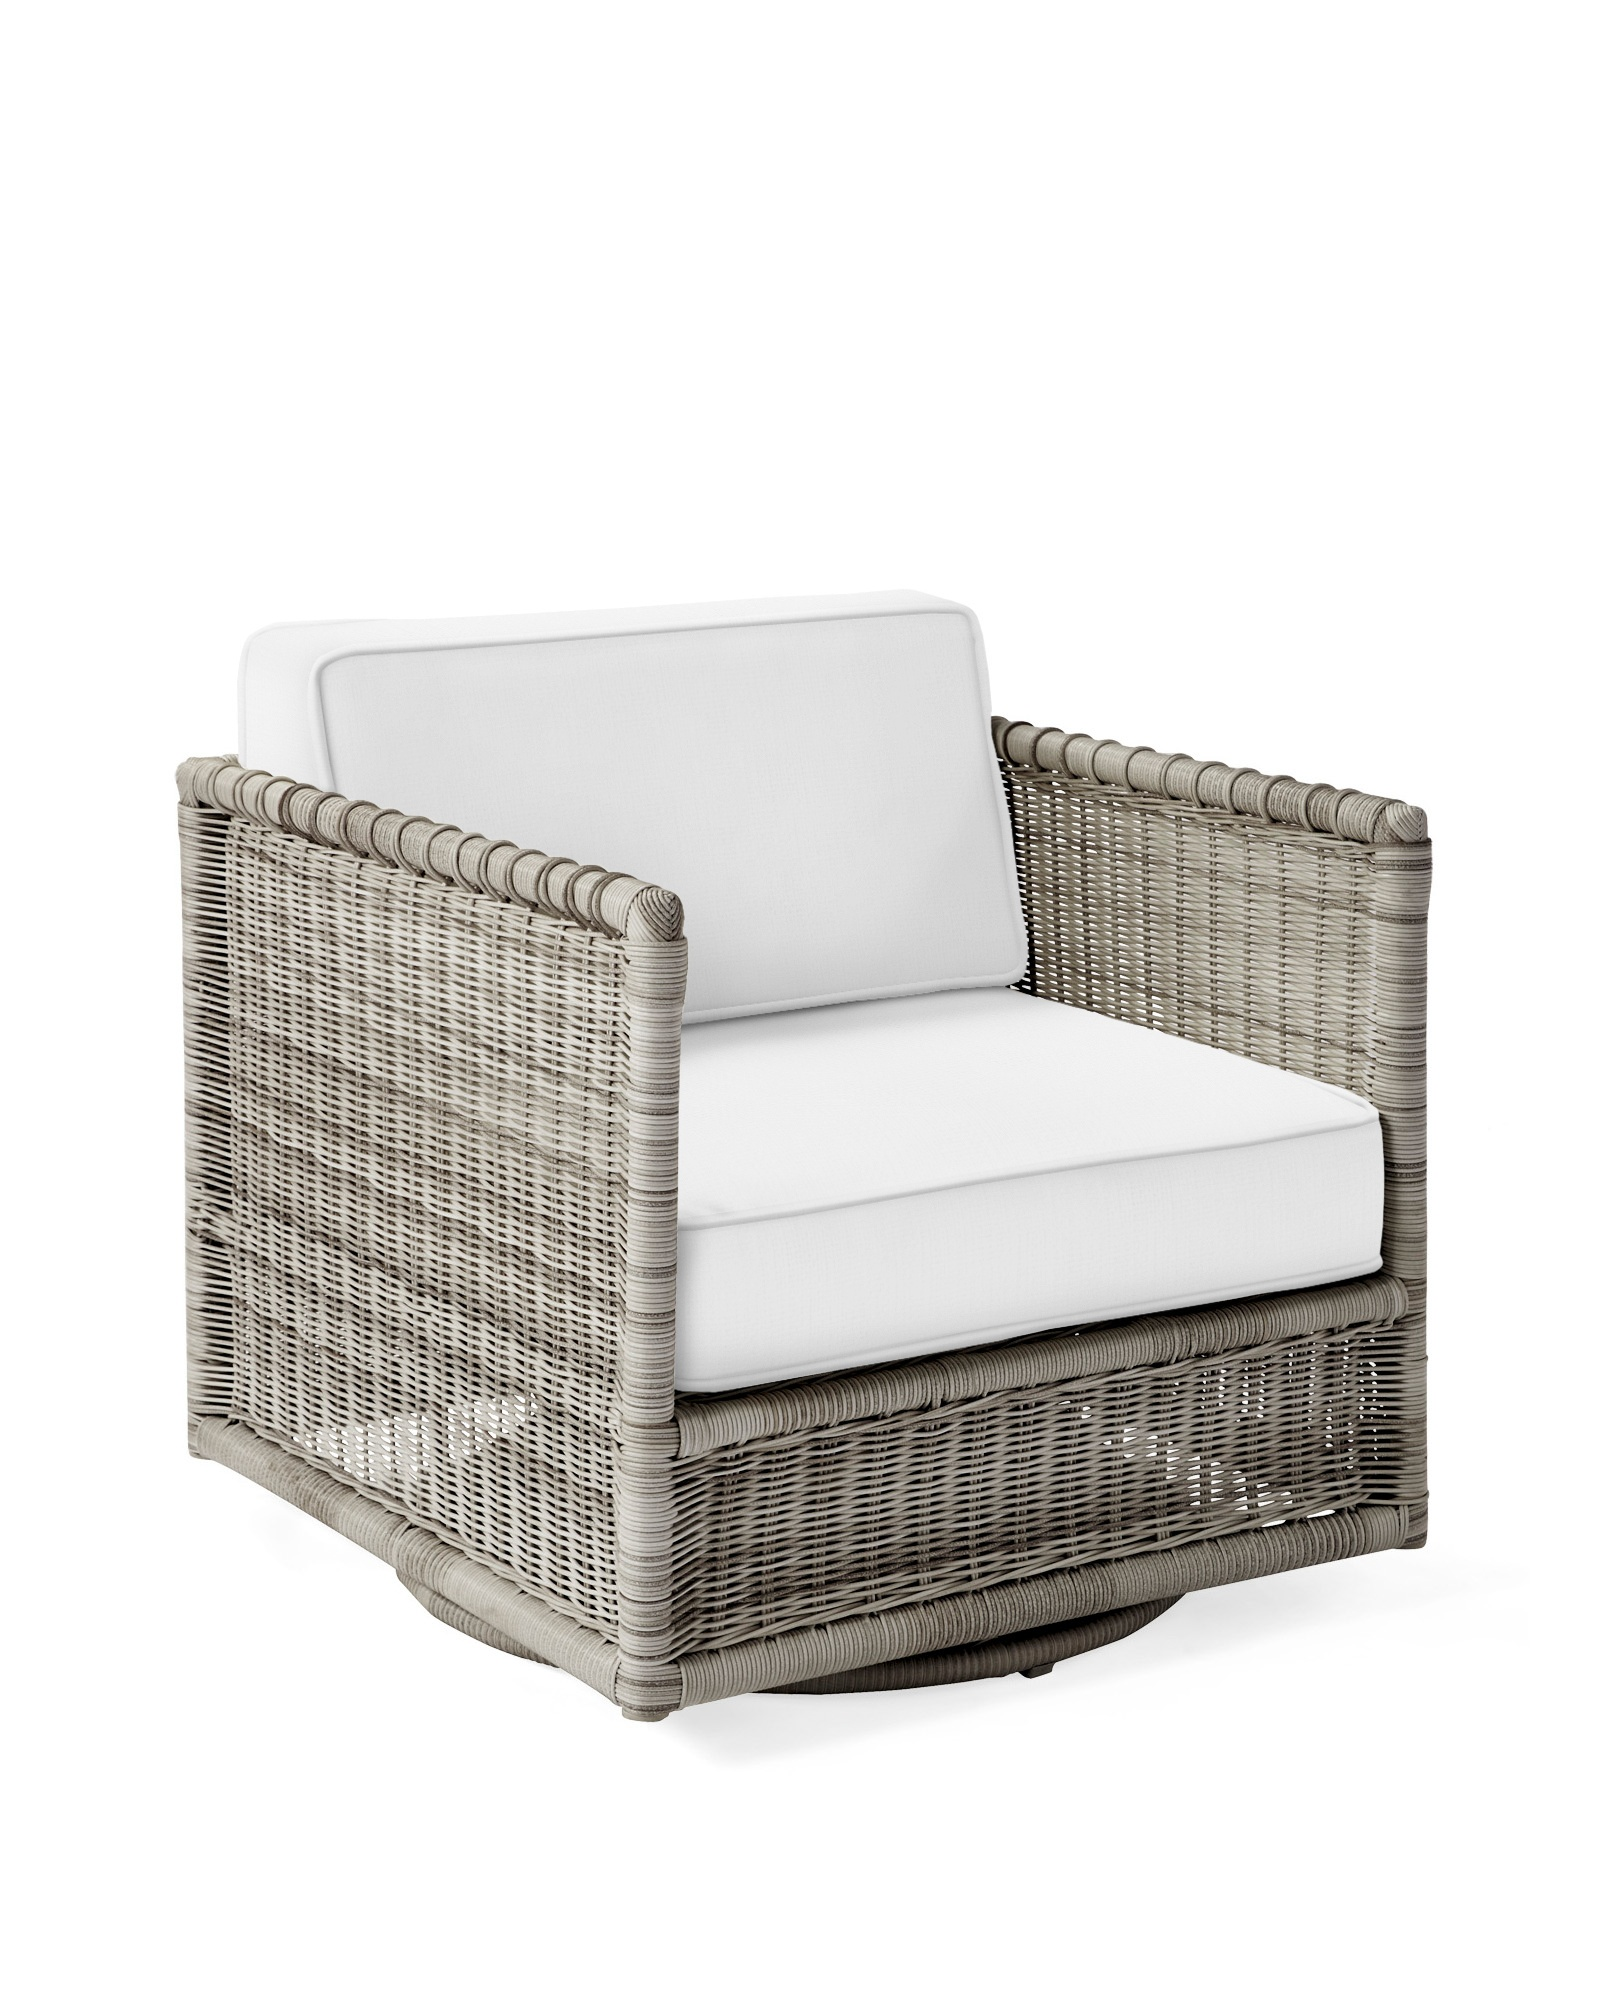 Pacifica Swivel Chair - Harbor Grey